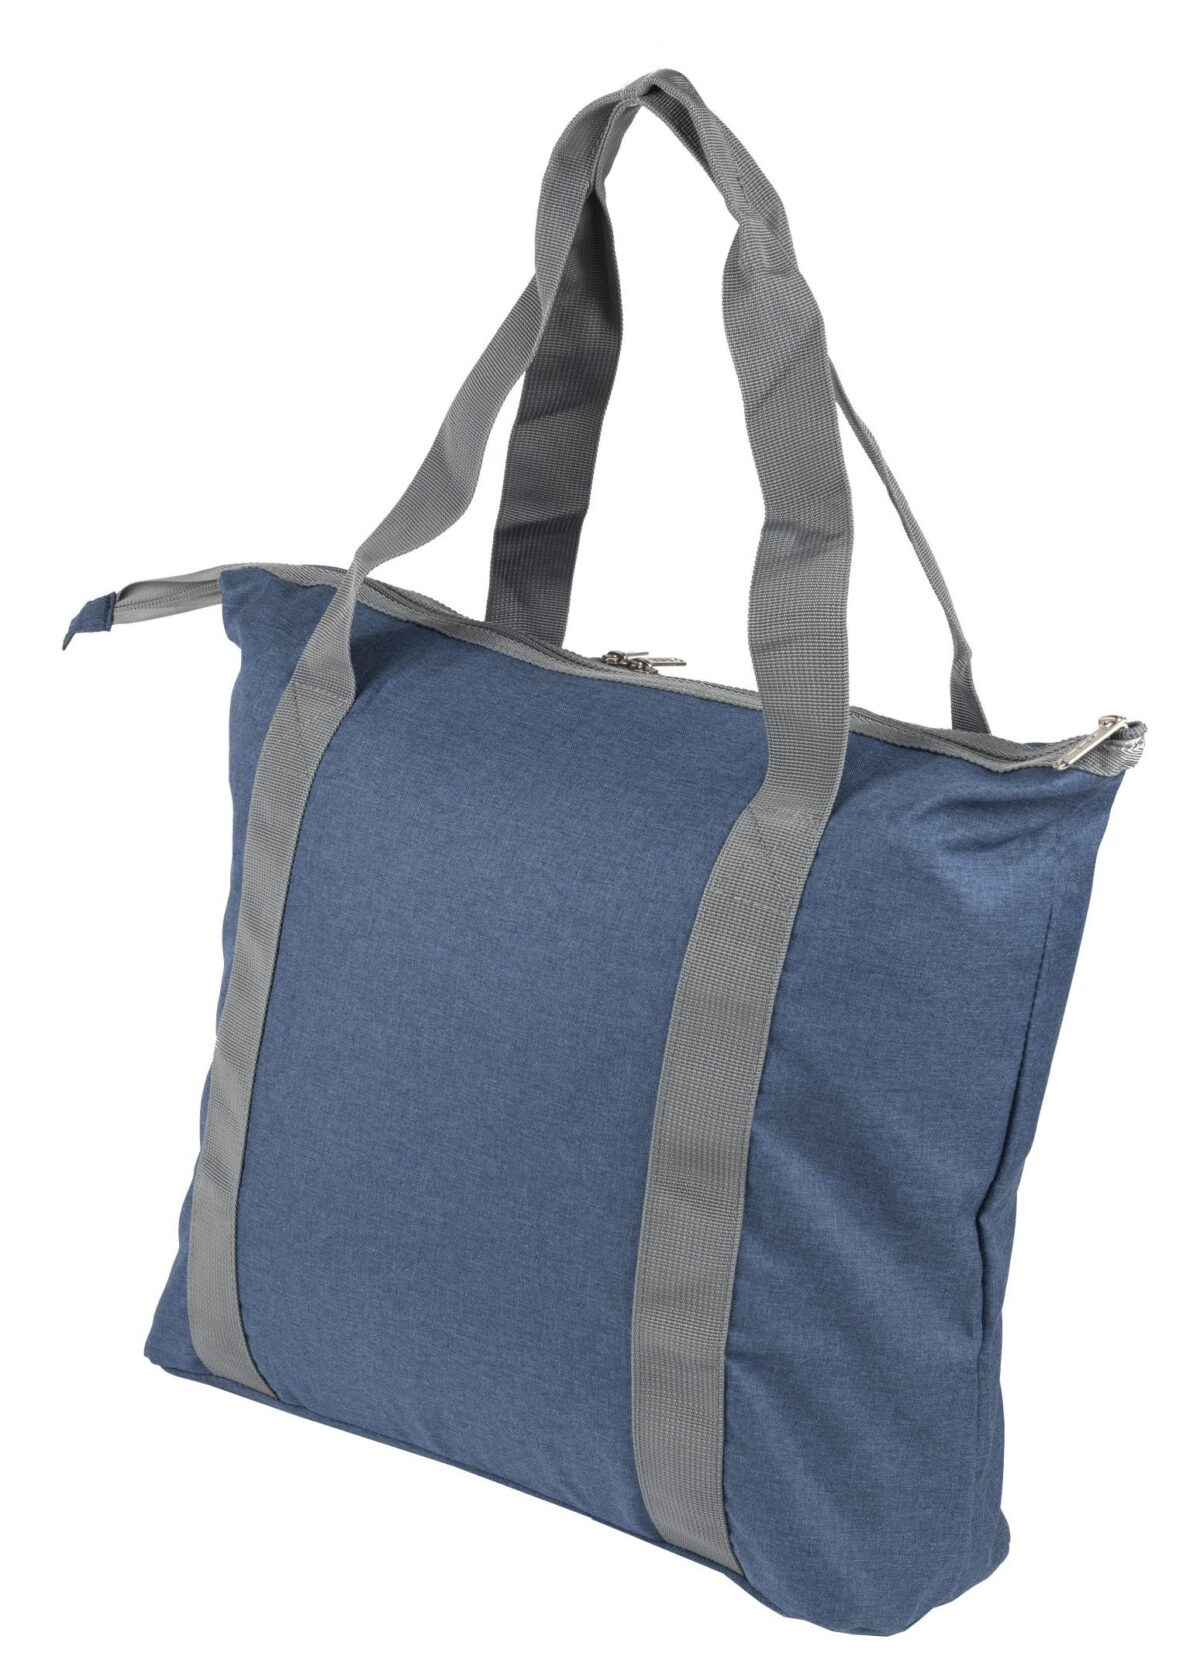 rPET draagtas opvouwbaar blauw achterzijde - Yipp & Co